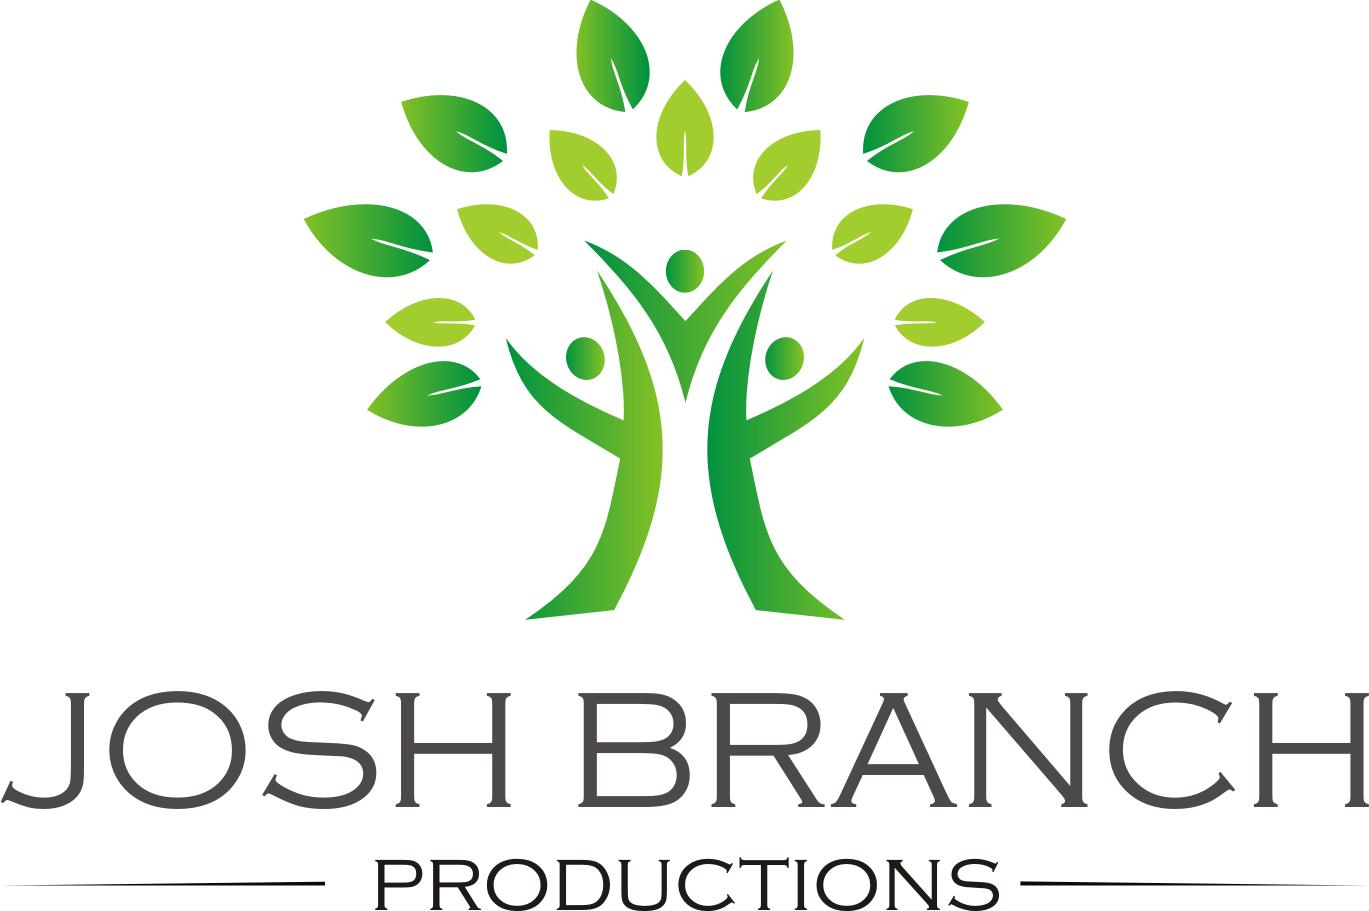 Josh Branch Productions